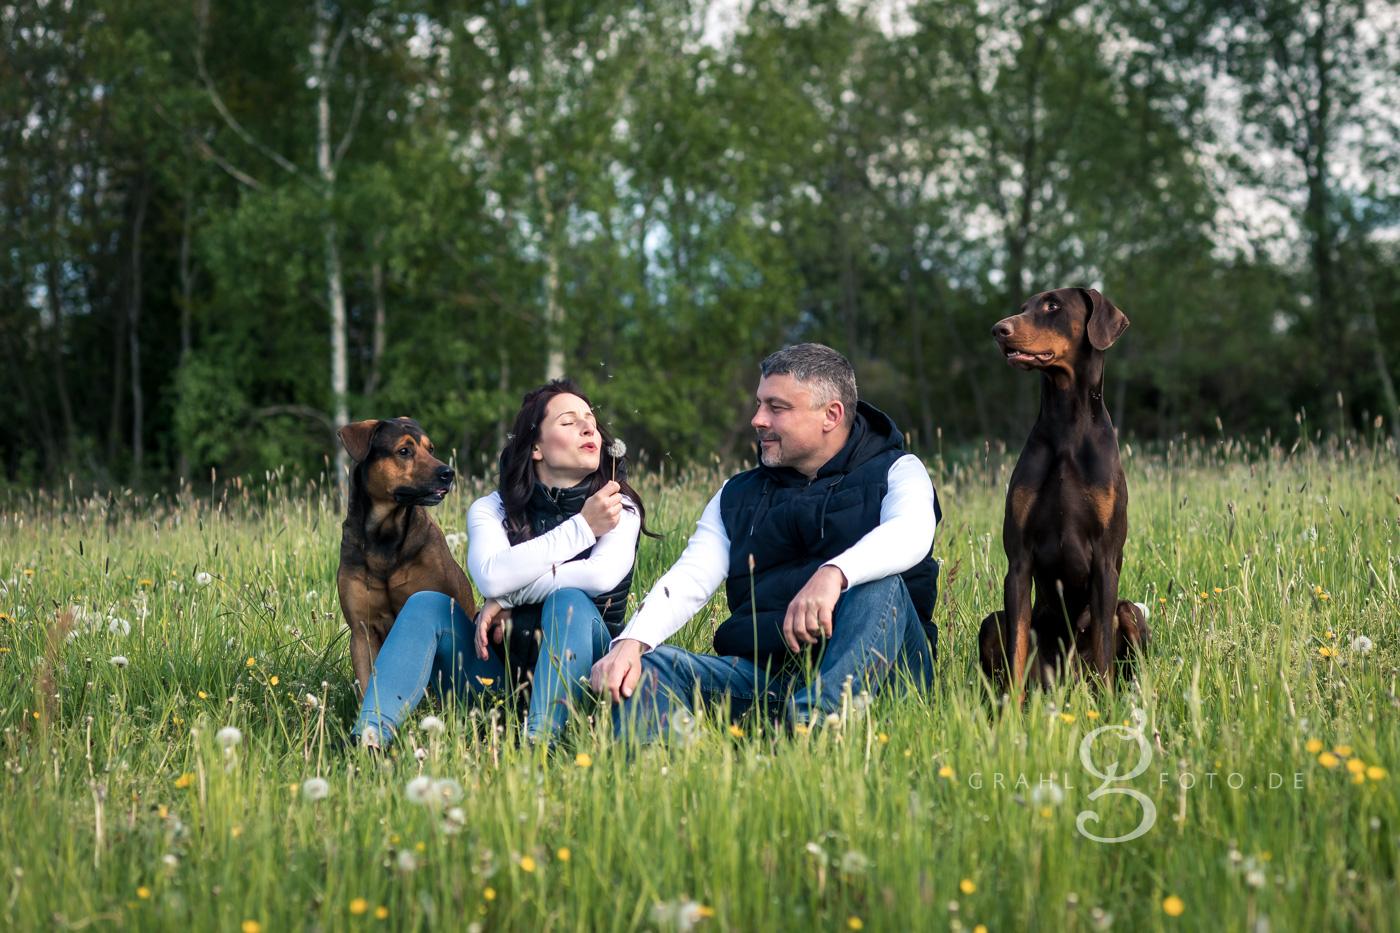 Grahlfoto.de Familienshooting Pärchenshooting mit Hunden draußen outdoor mit Cordula Maria Grahl Ausflug mit Fotos